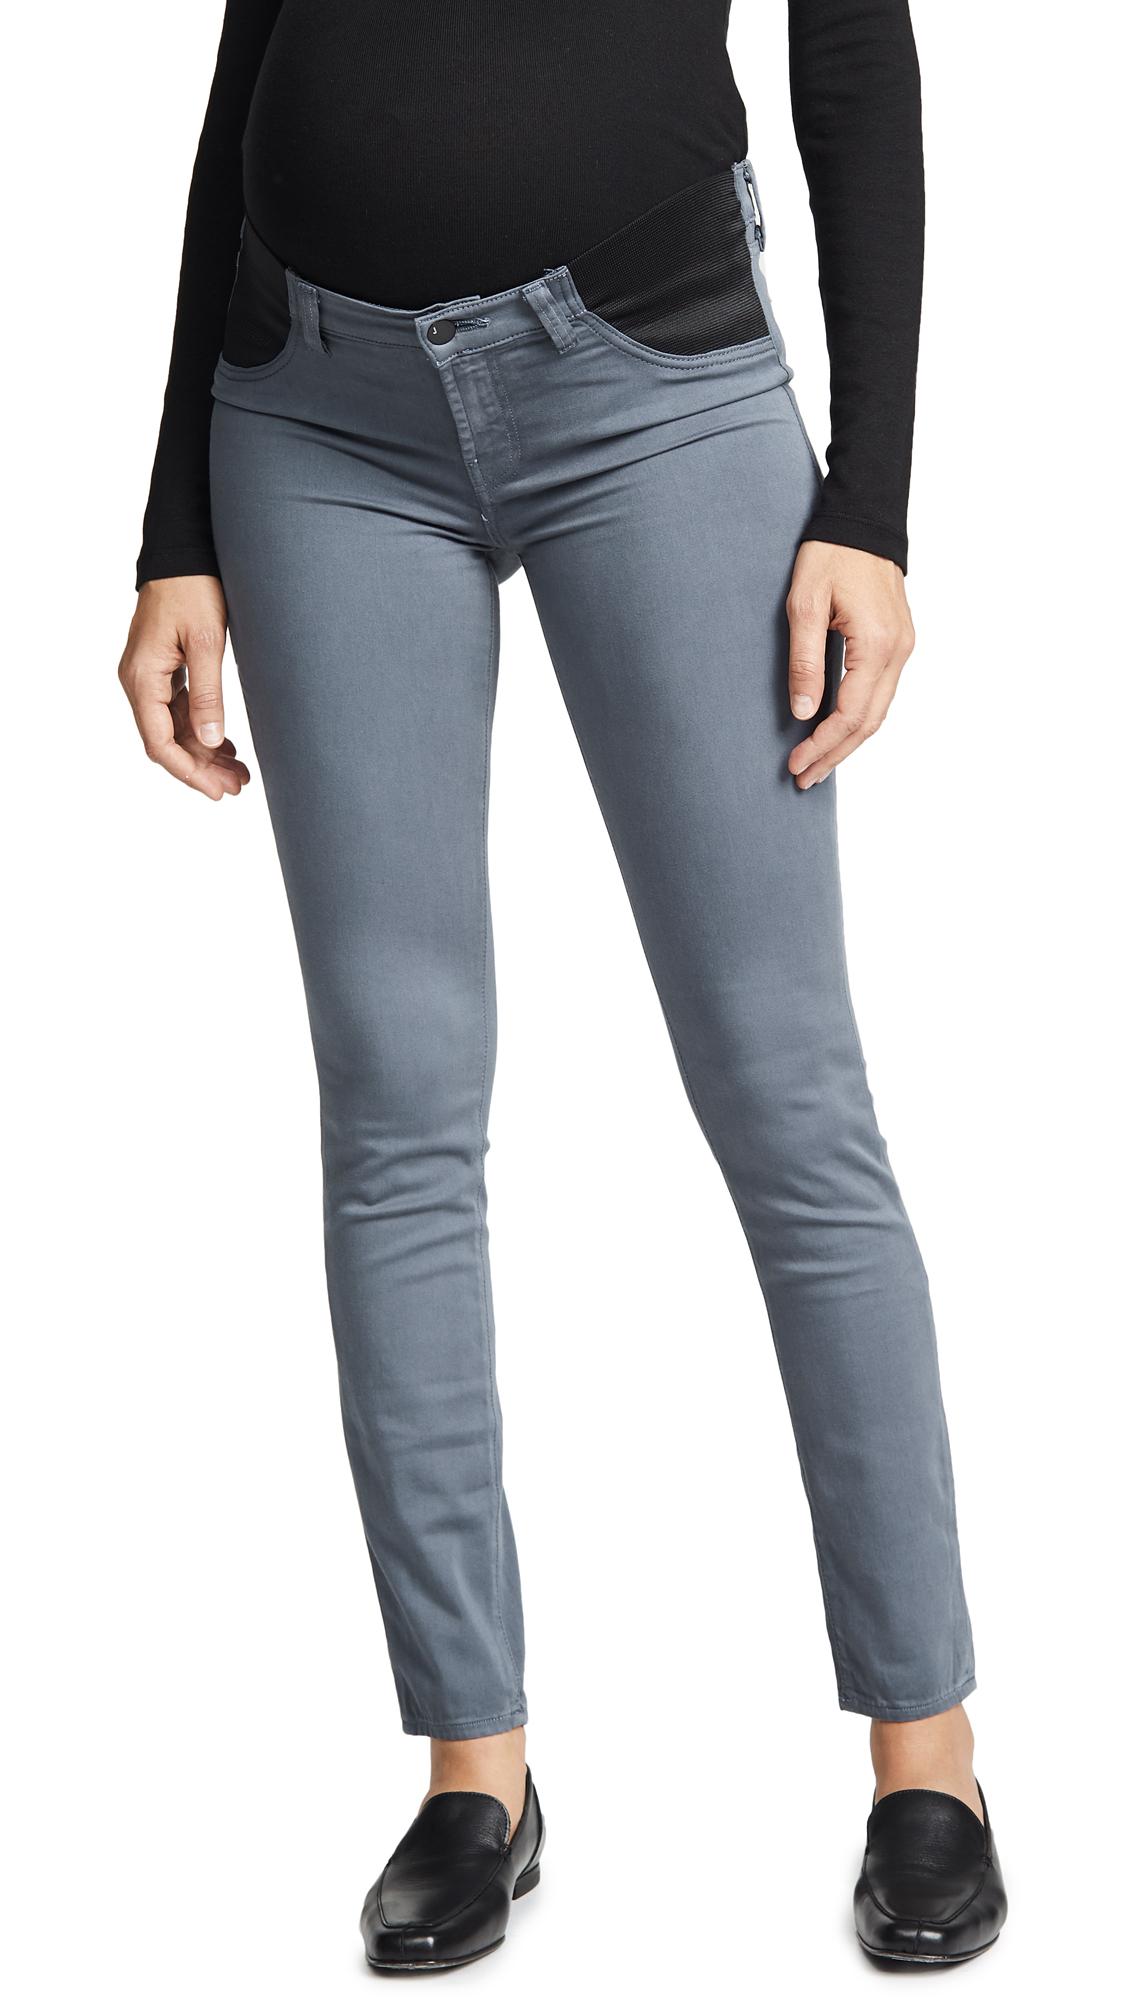 Mama J Maternity Capri Jeans